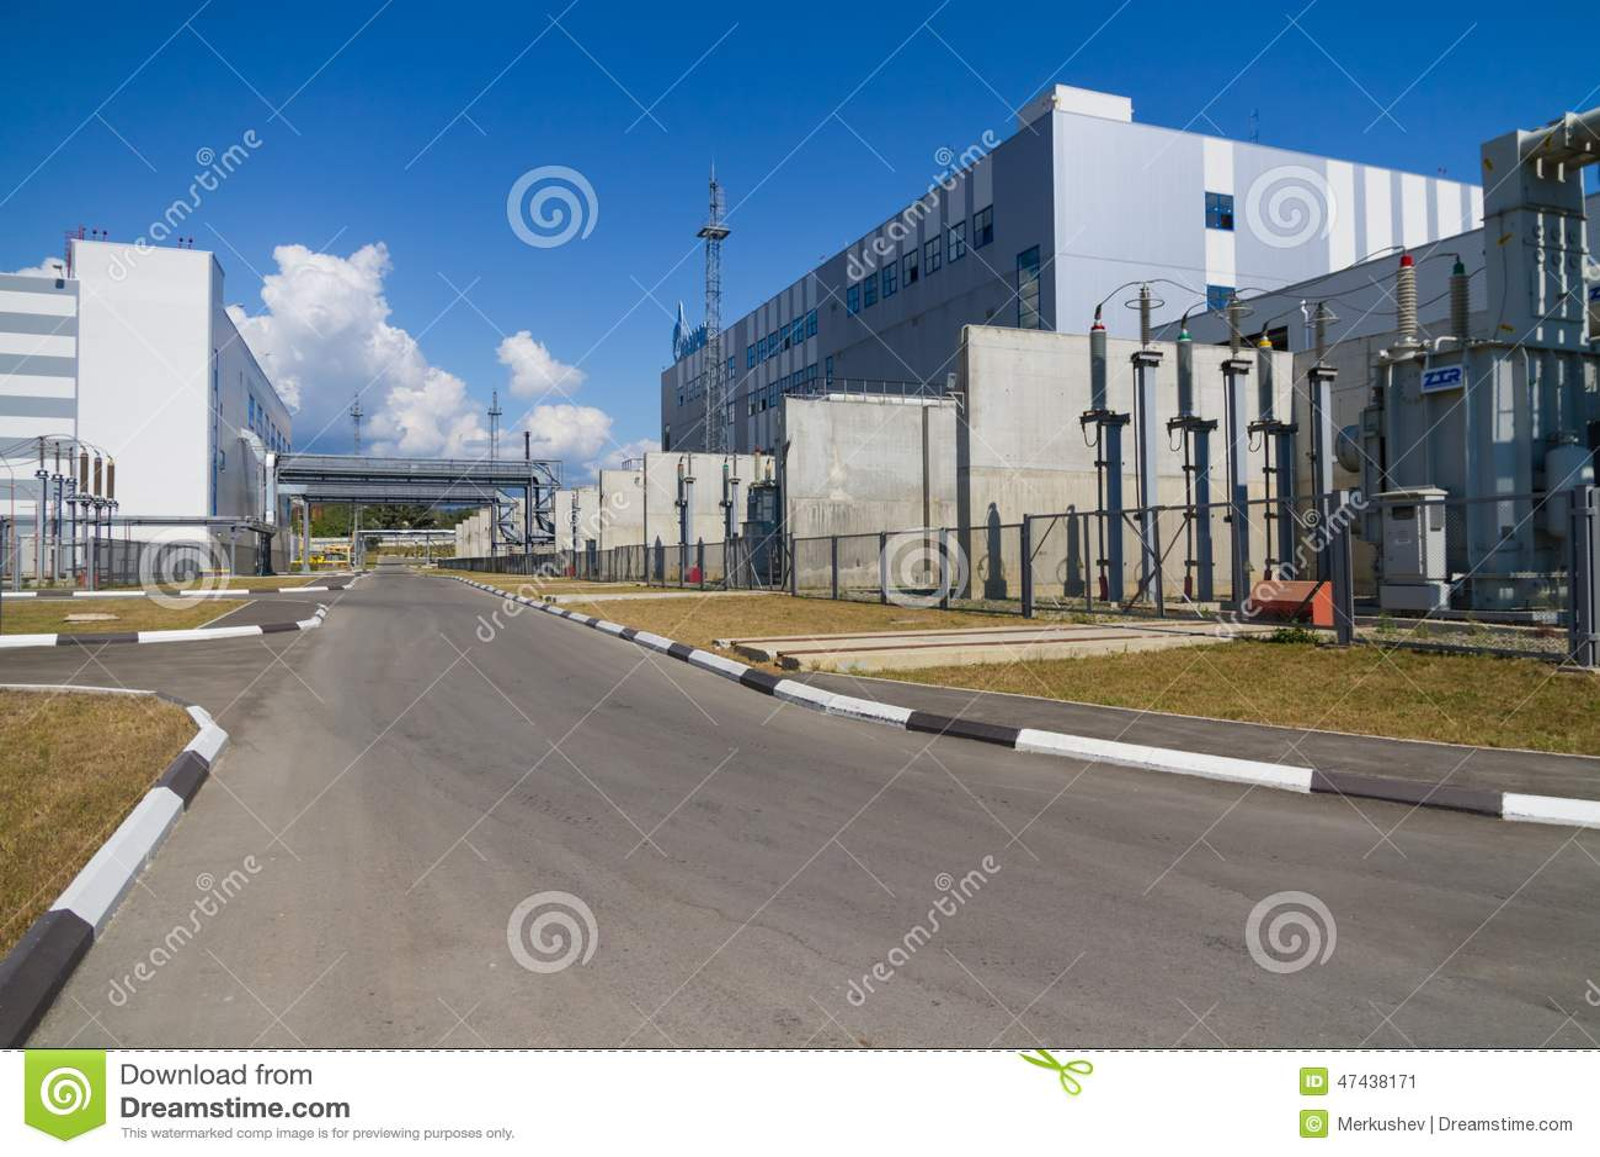 Una zona industriale